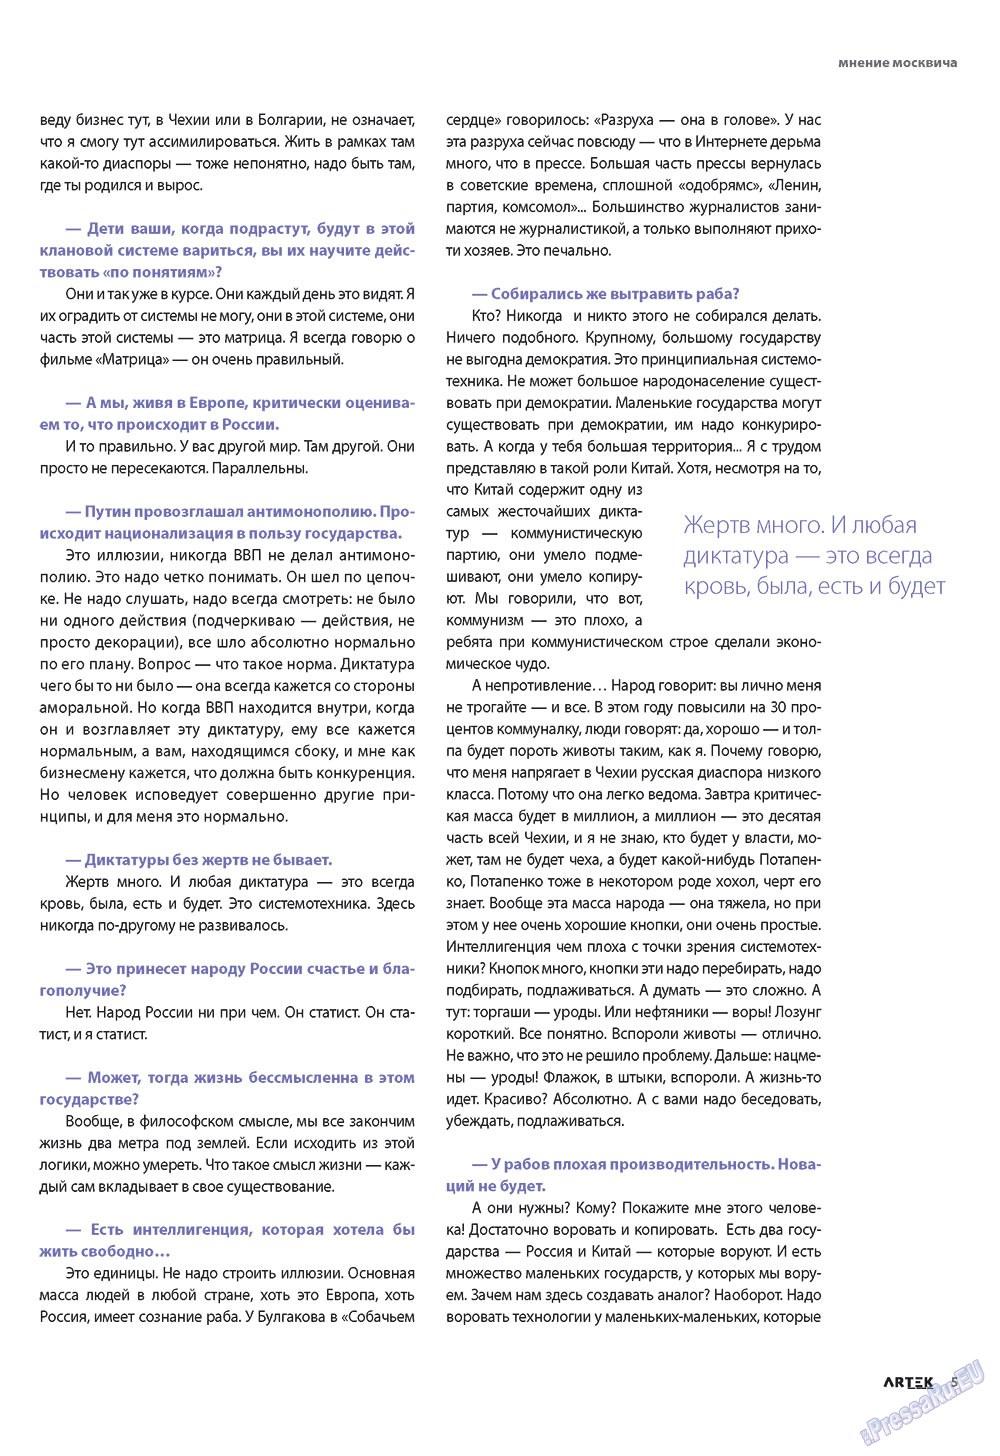 Артек (журнал). 2009 год, номер 4, стр. 5